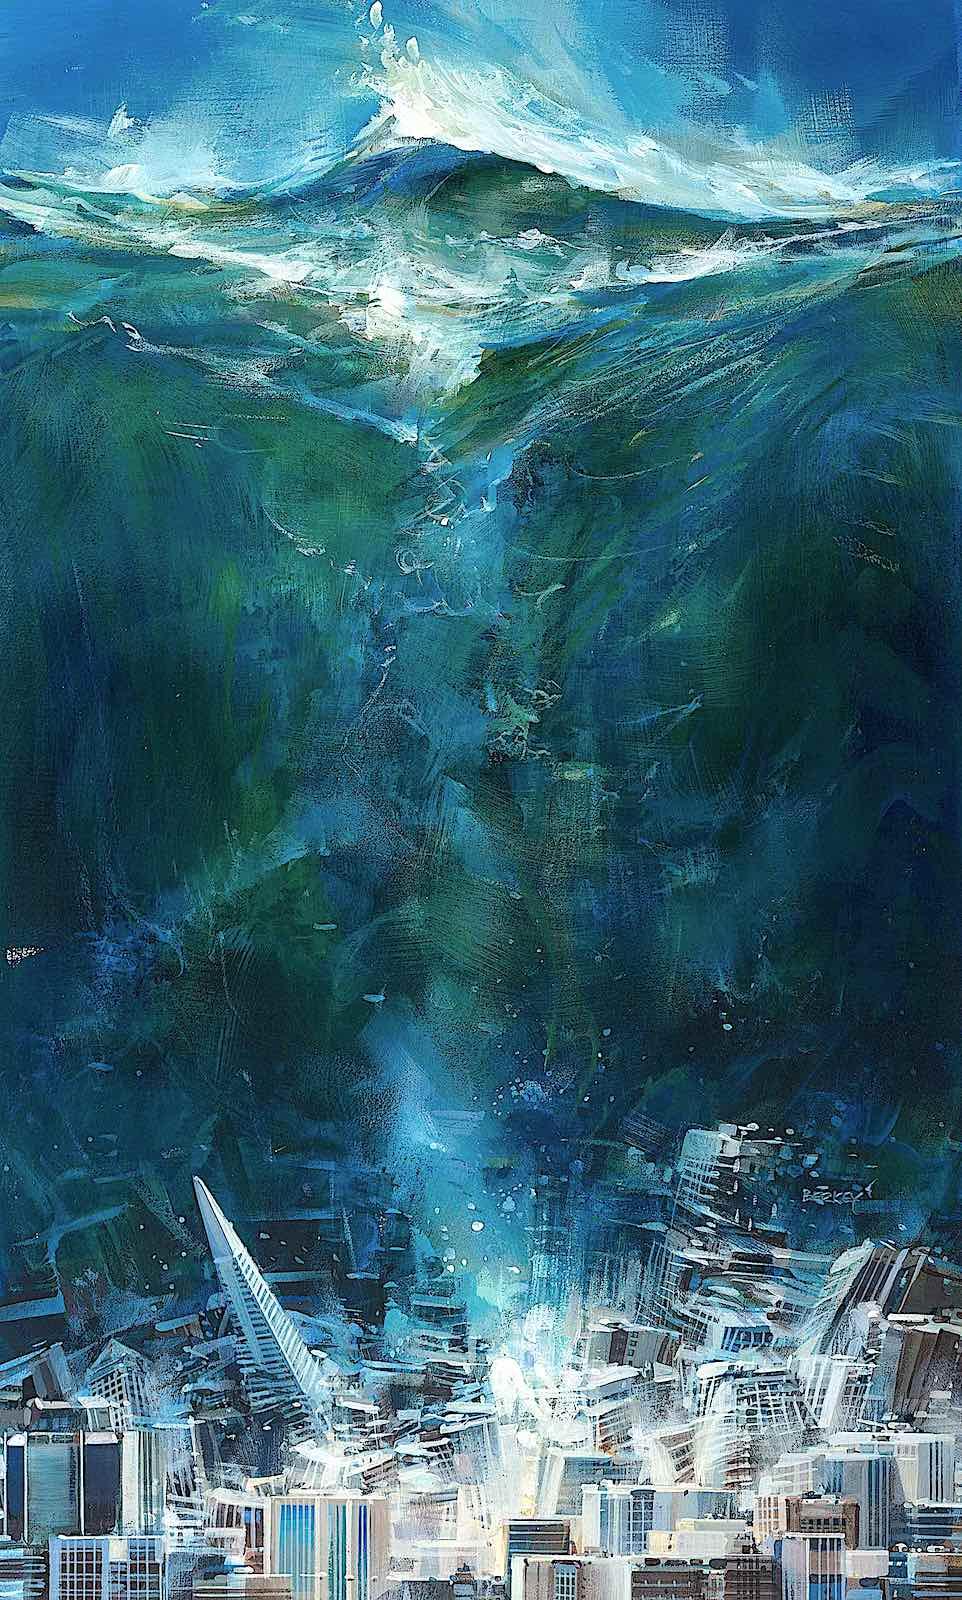 a John Berkey illustration of a giant tsunami hitting a big city